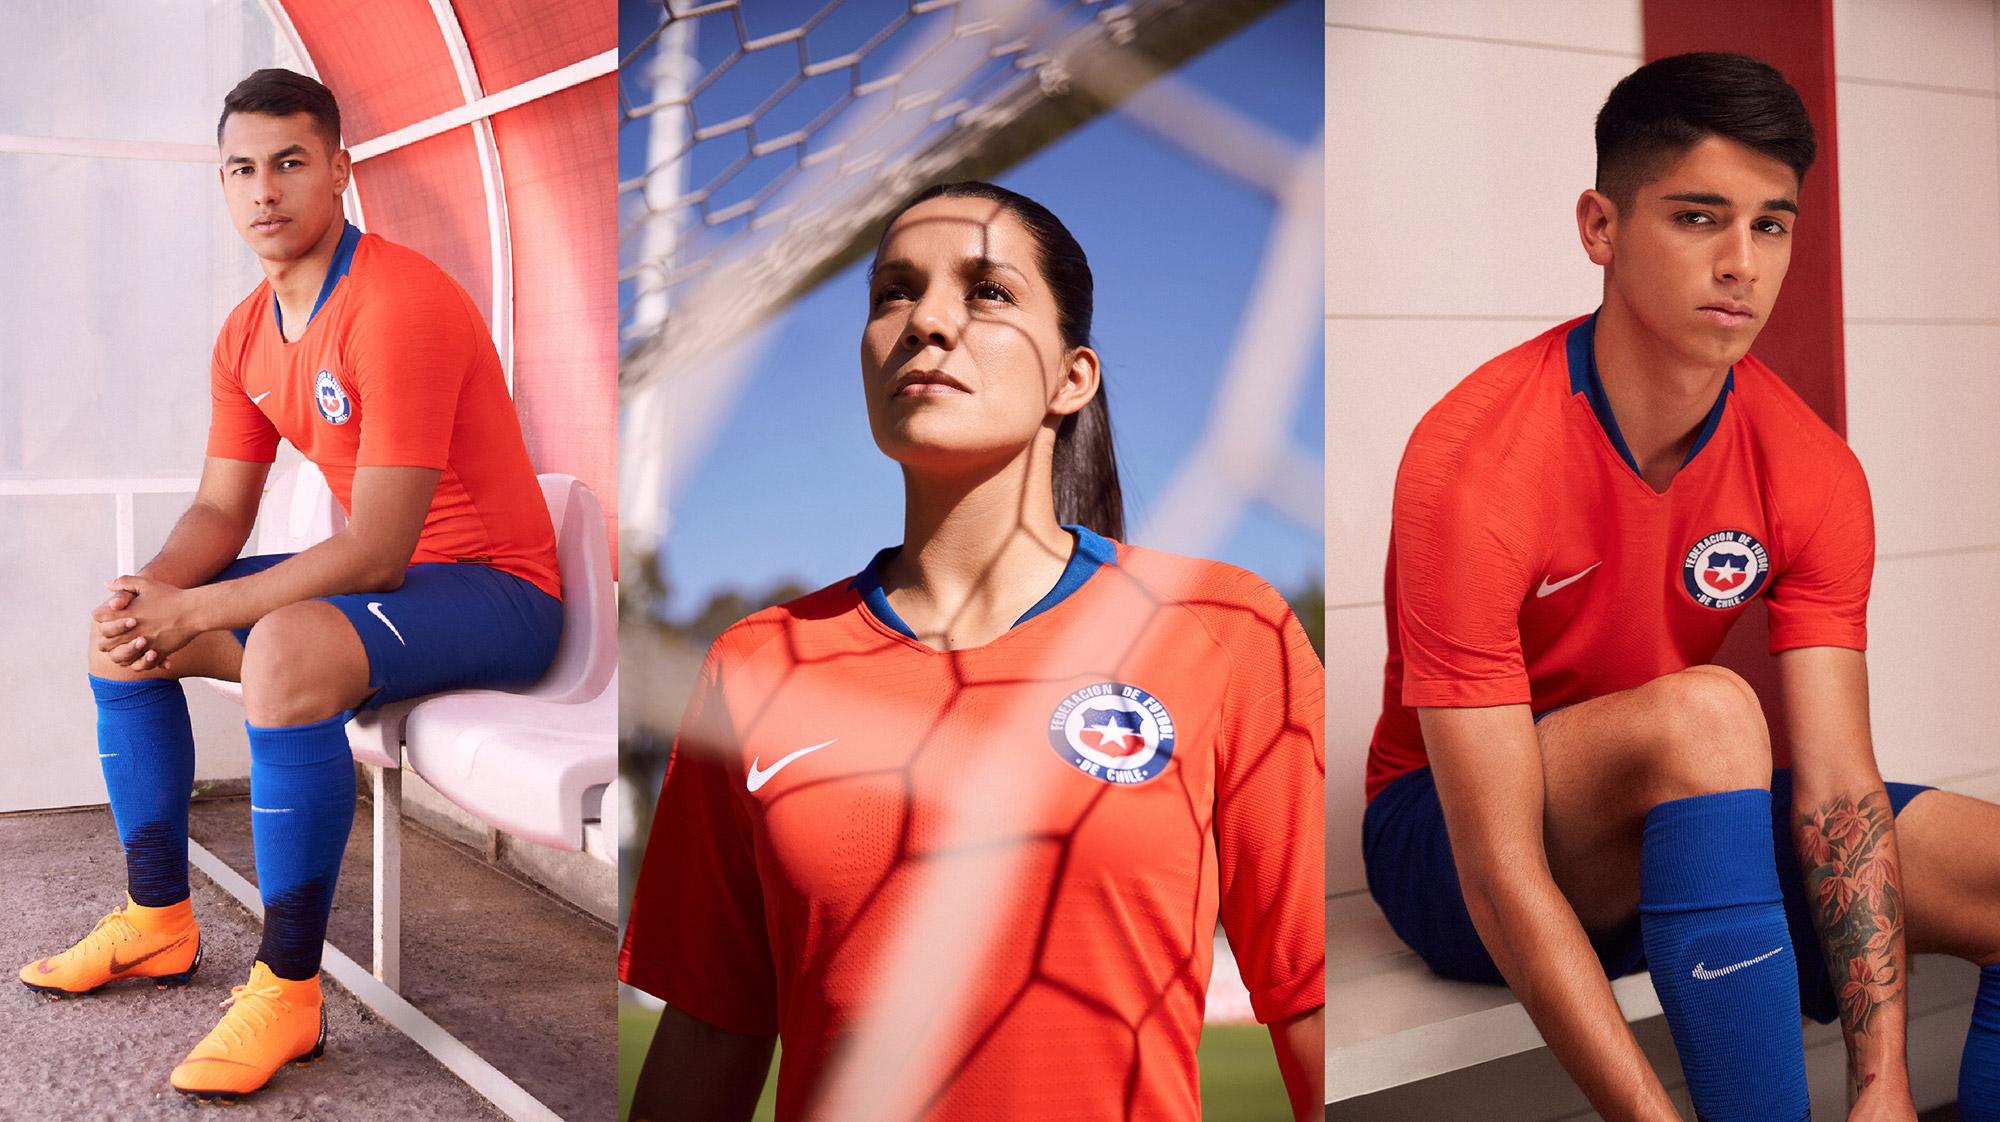 Nike-News-Chile-Soccer-Jersey-Triptic_78488